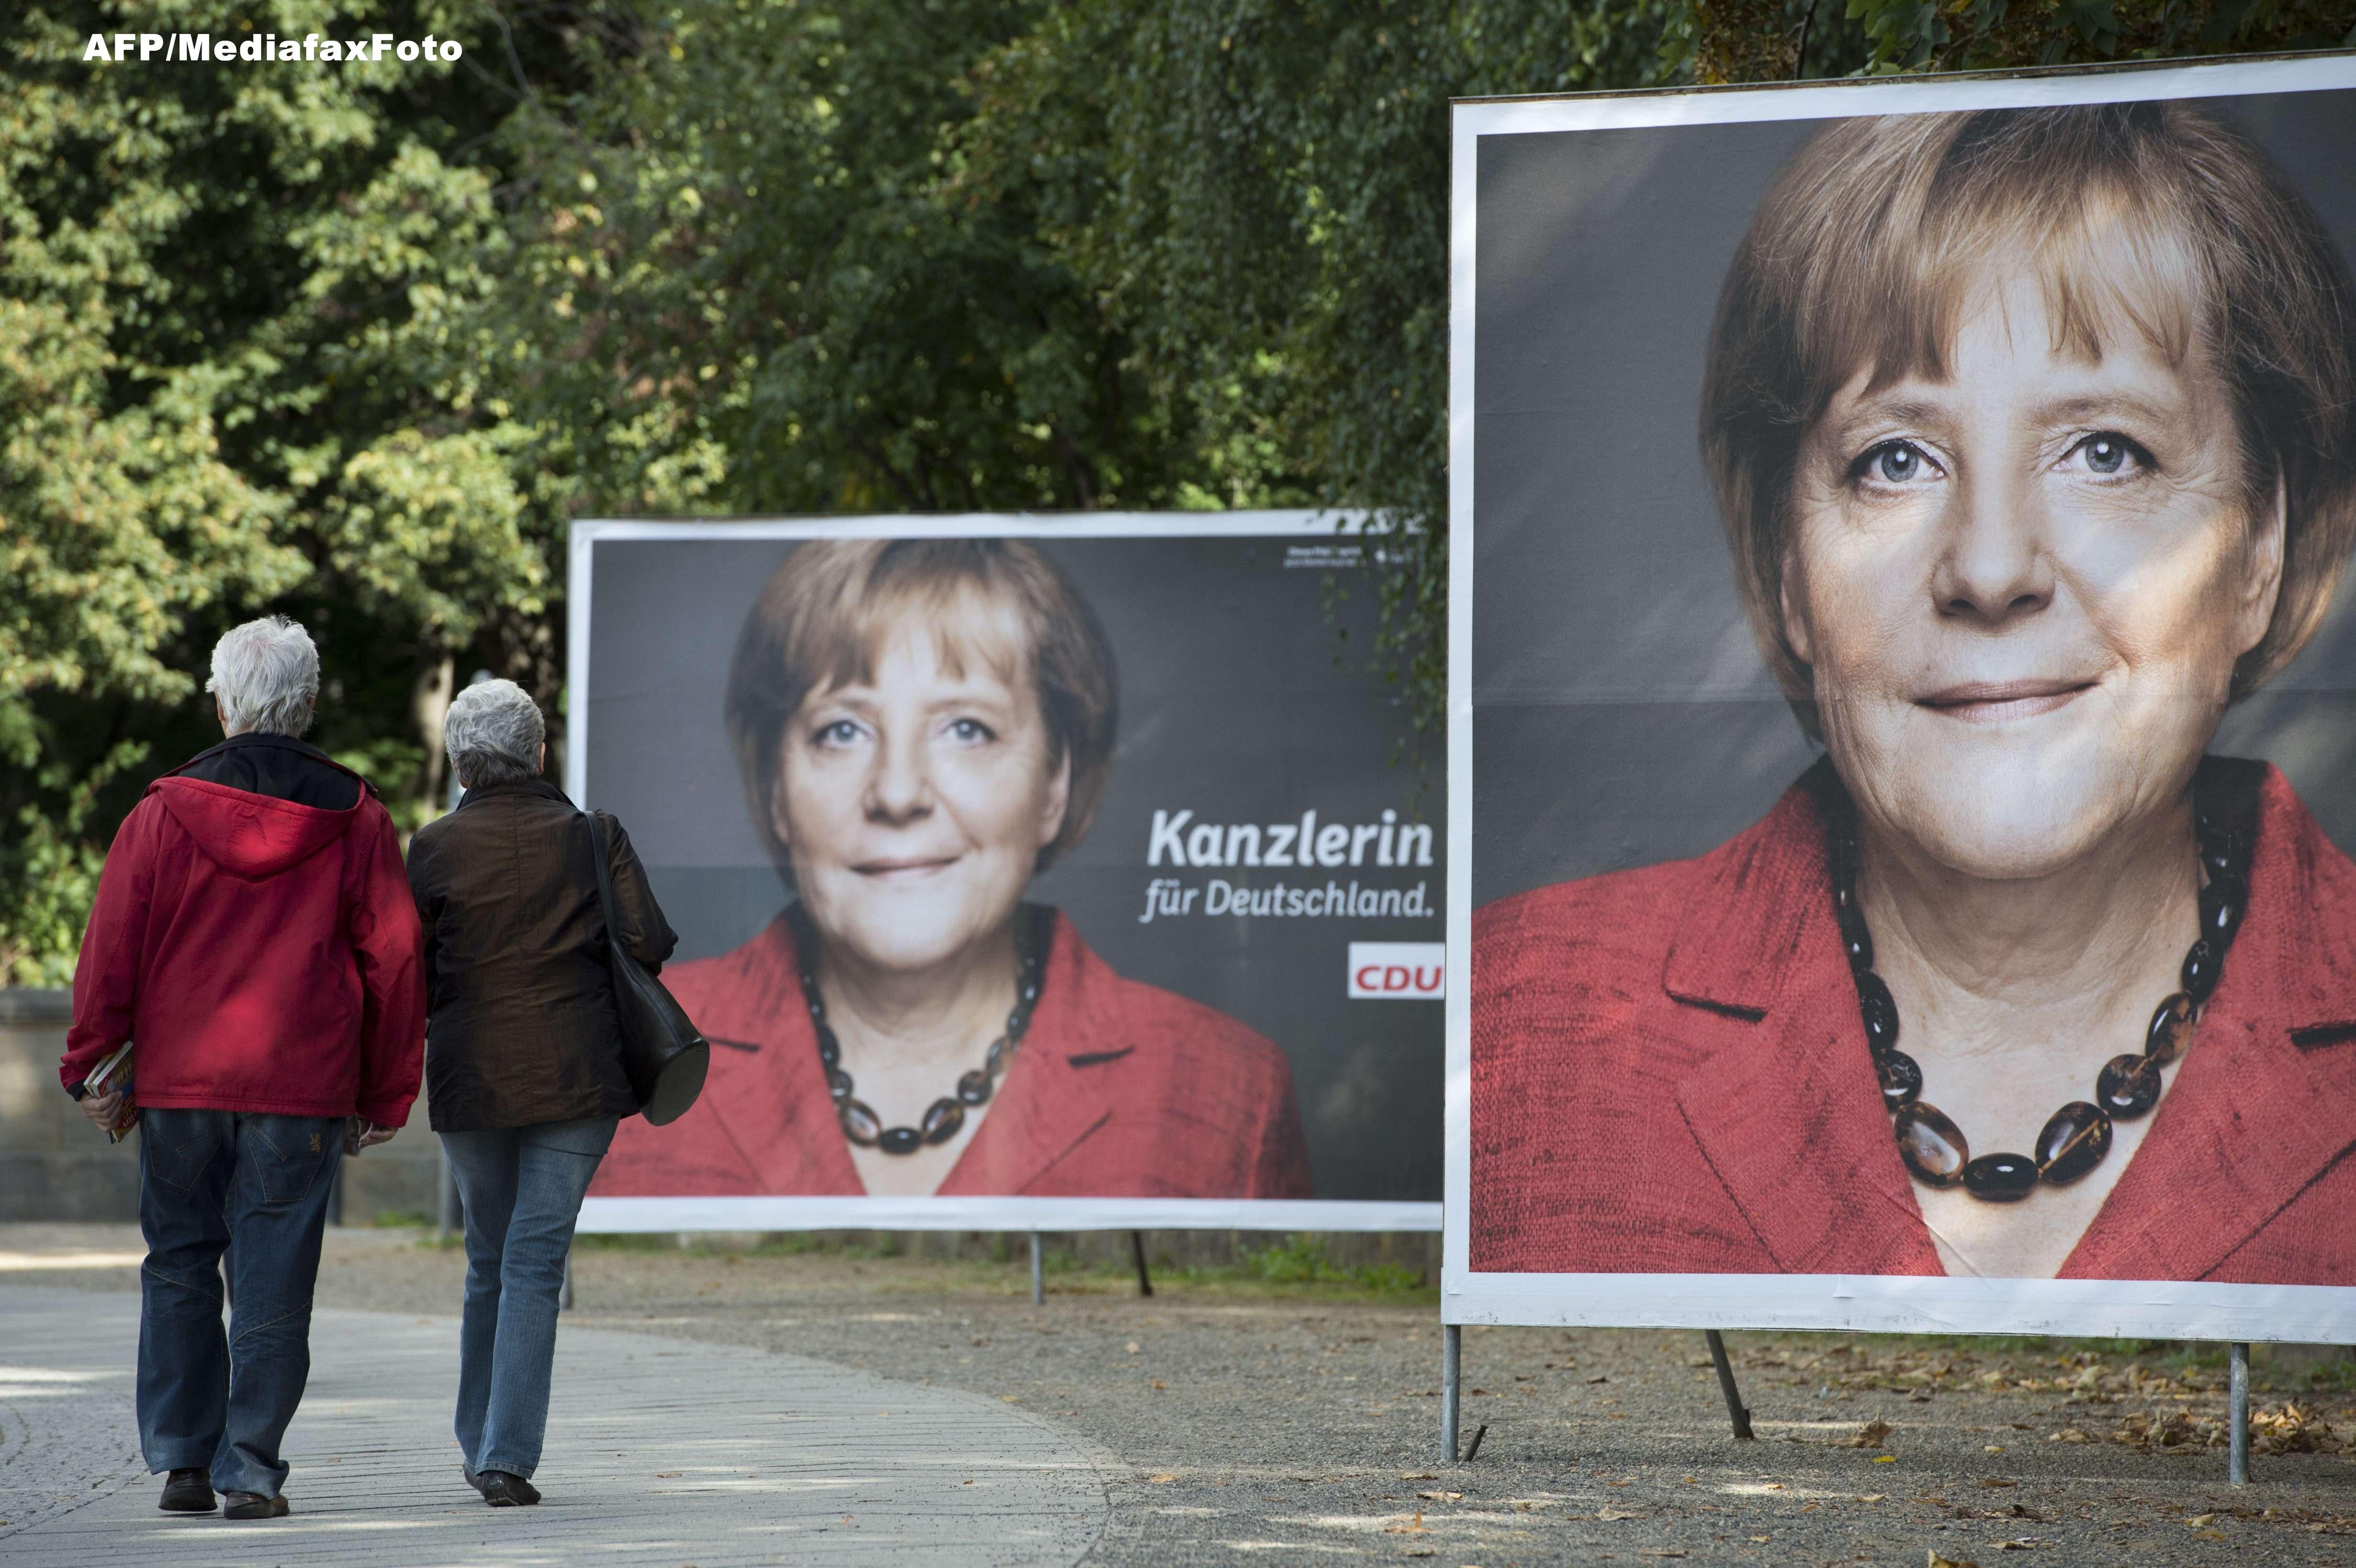 Alegeri legislative in Germania. Angela Merkel nu va obtine majoritatea, nici macar cu liberalii